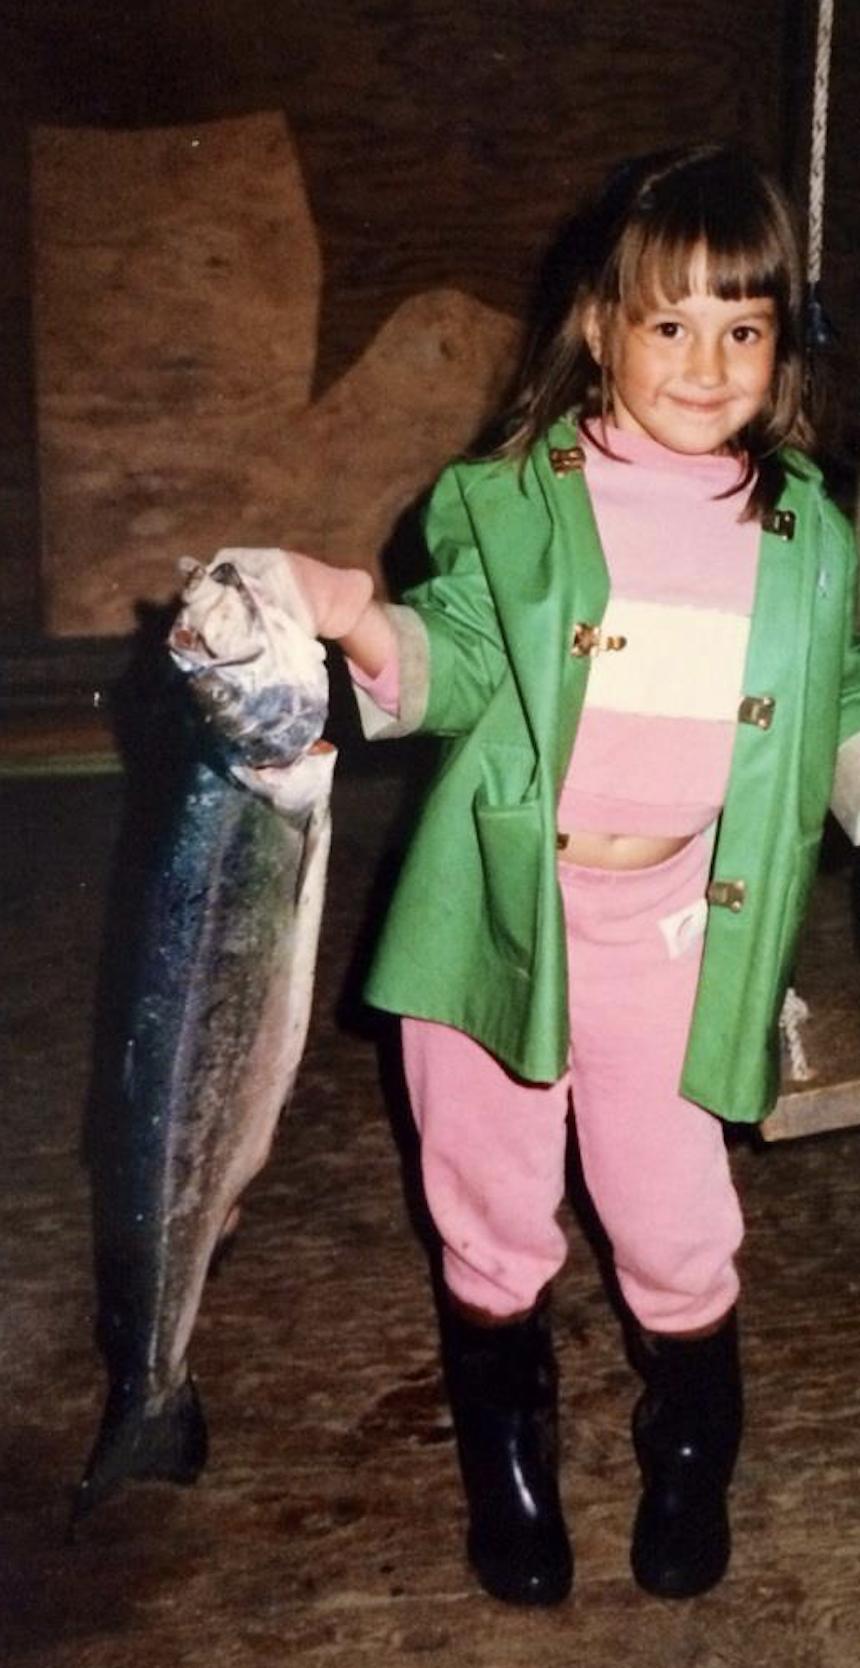 Proud fishergirl!